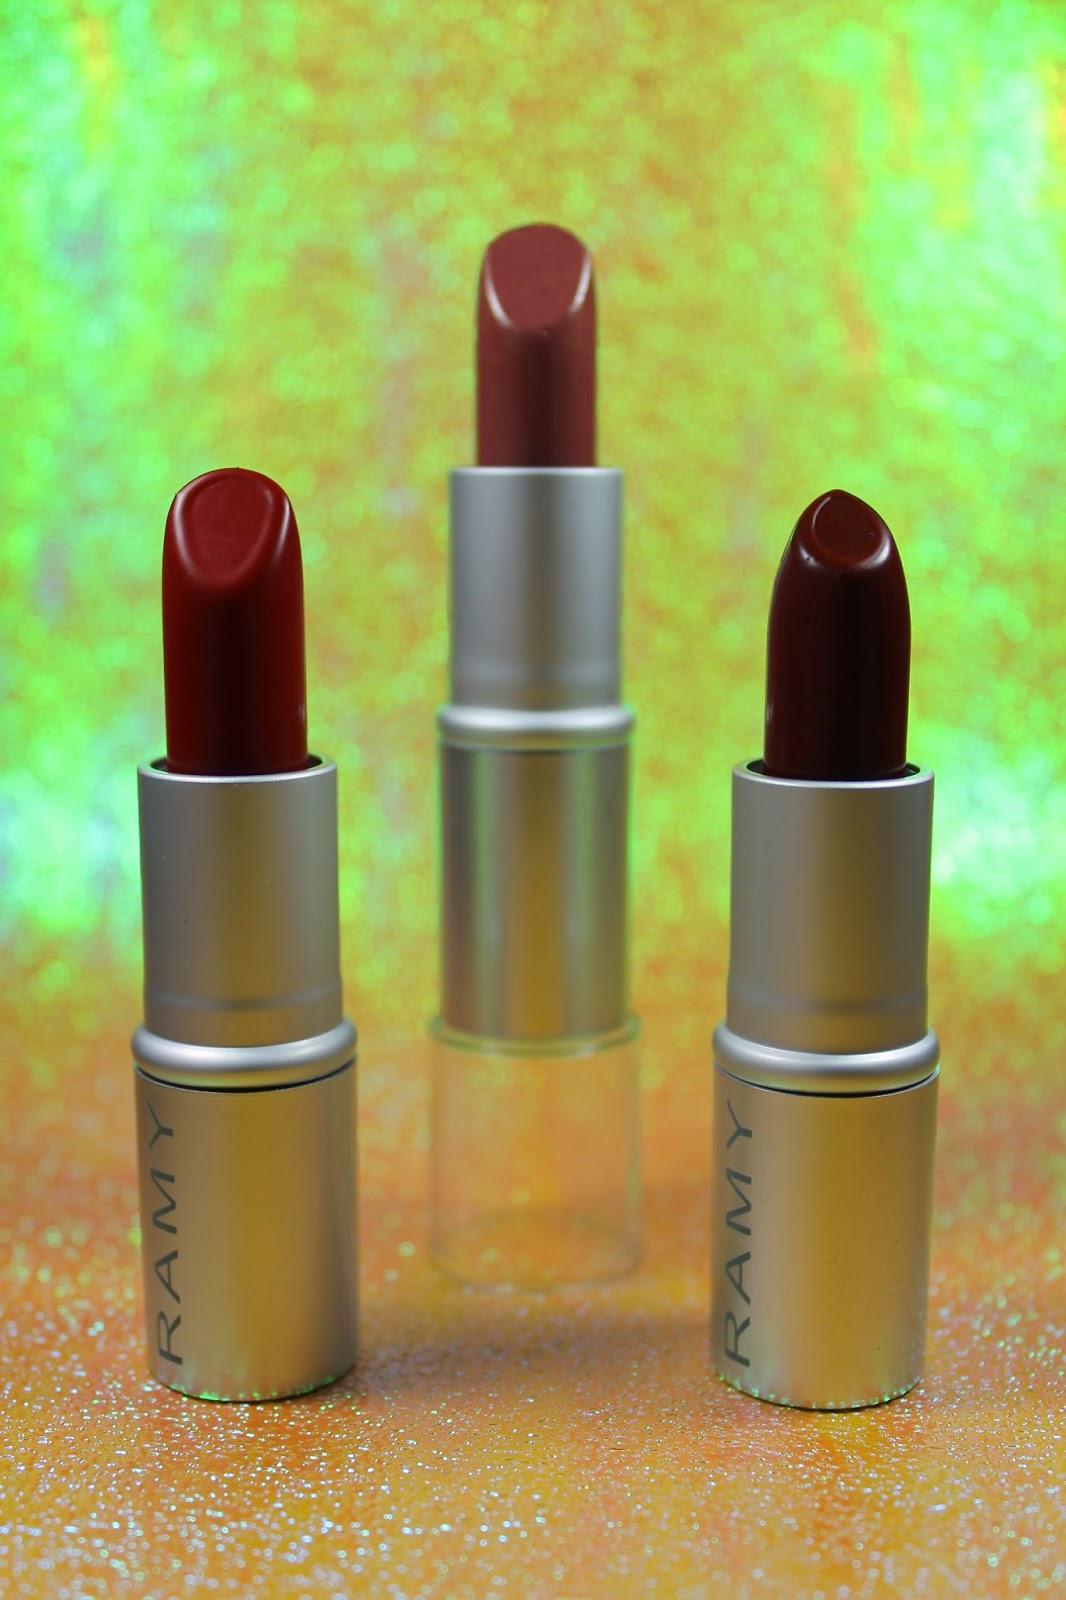 Shine Beauty Beacon M M S Candy Mani: Shine Beauty Beacon: July 2014